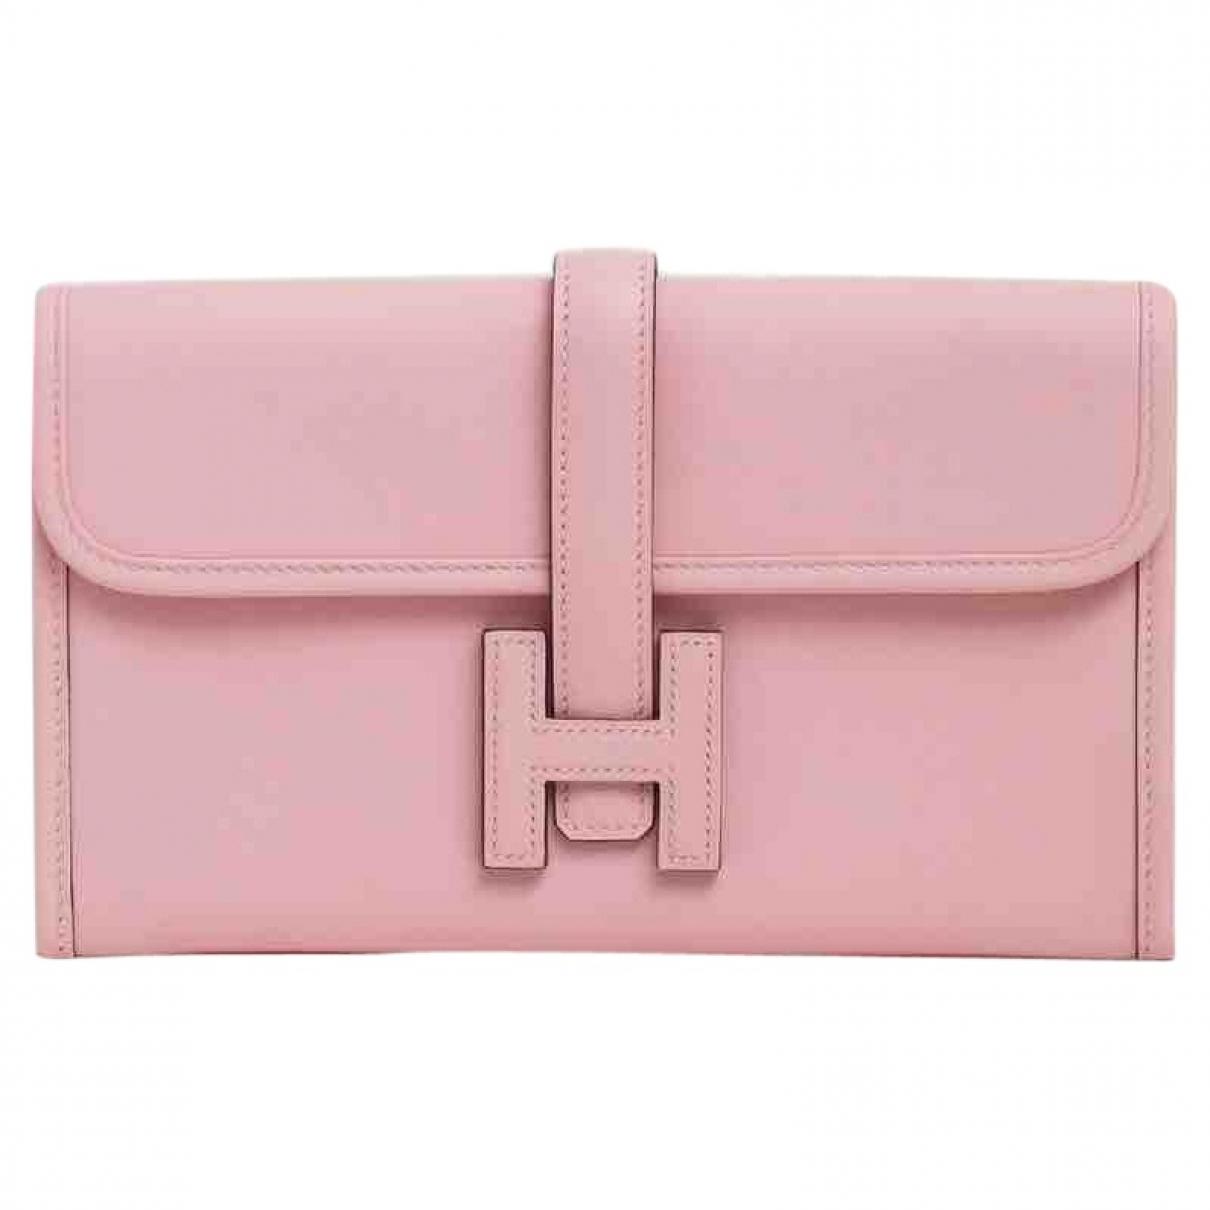 Hermes - Pochette Jige pour femme en cuir - rose